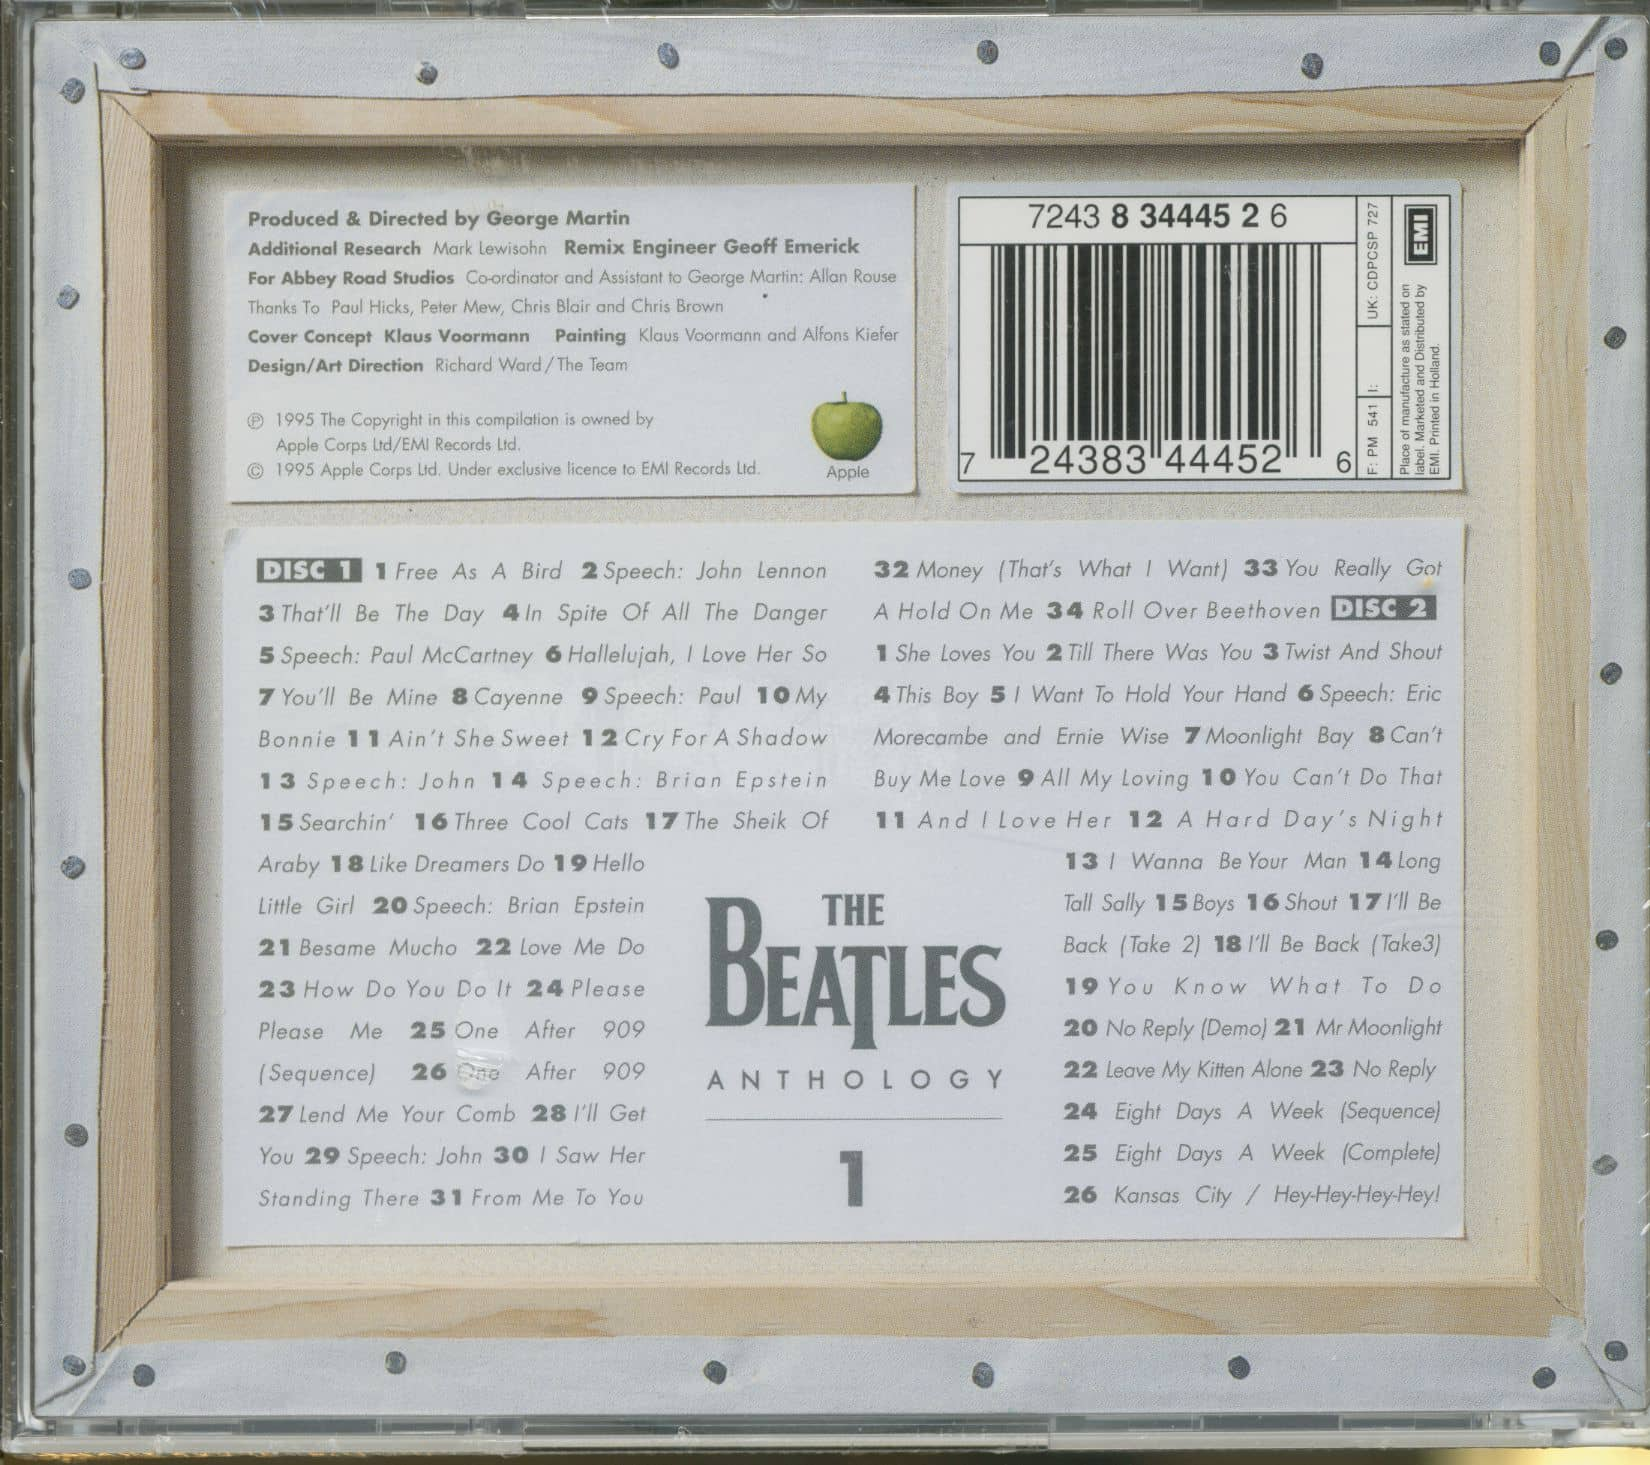 The Beatles Anthology 1 2-CD